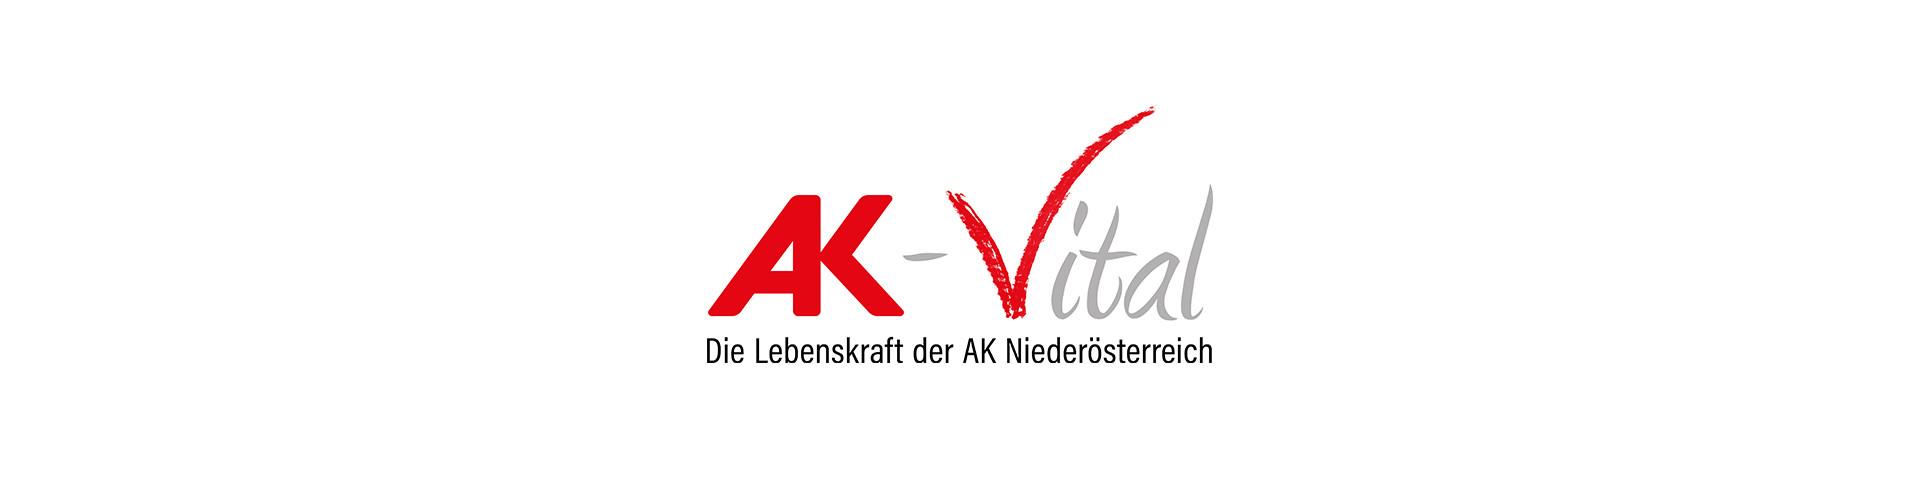 Logo AK-Vital ©  , AK Niederösterreich